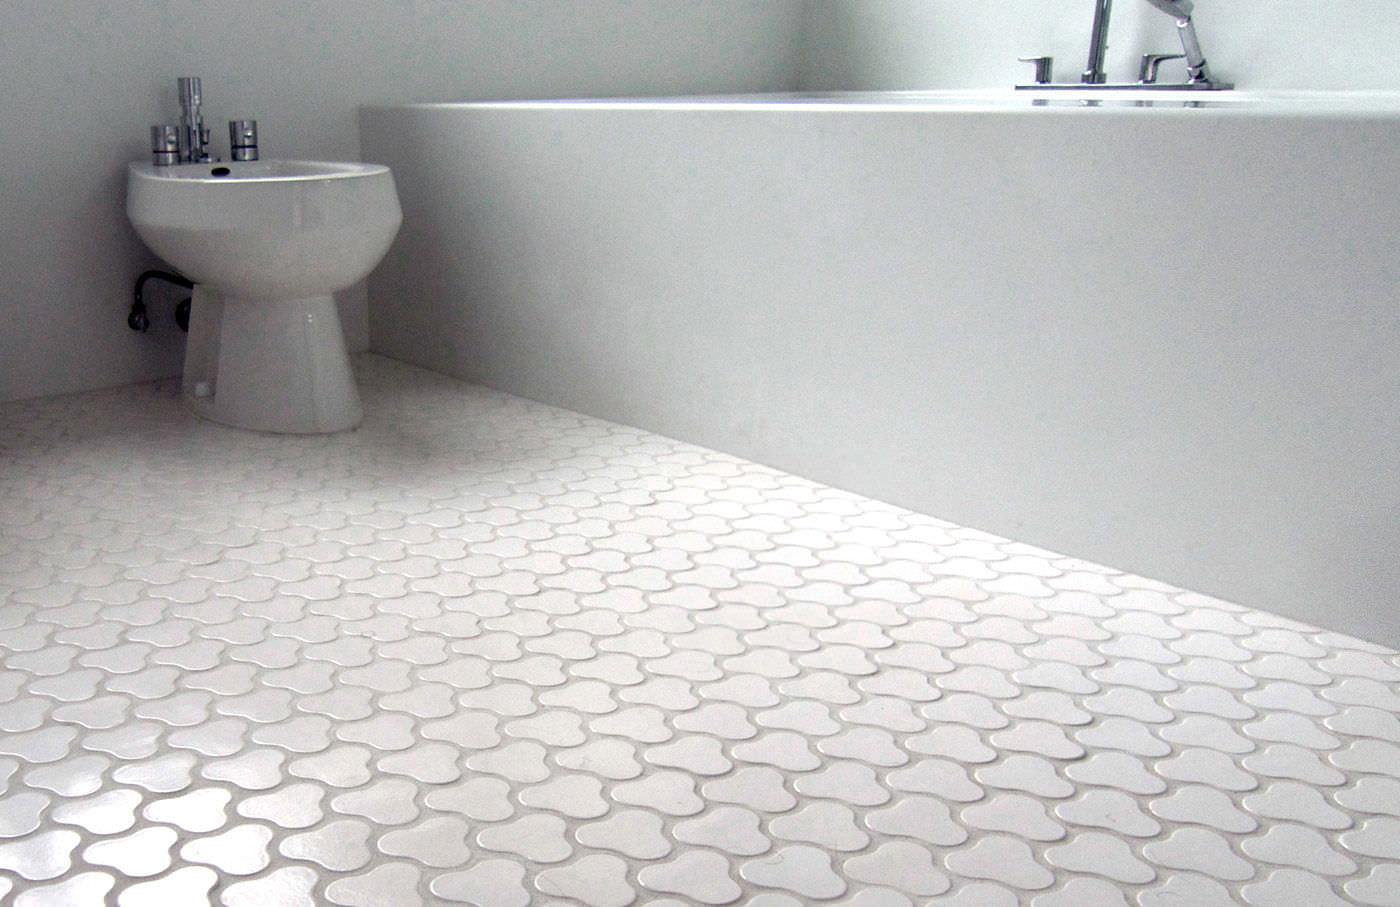 floor-tile-ceramic-bathroom-plain-64419-4233321